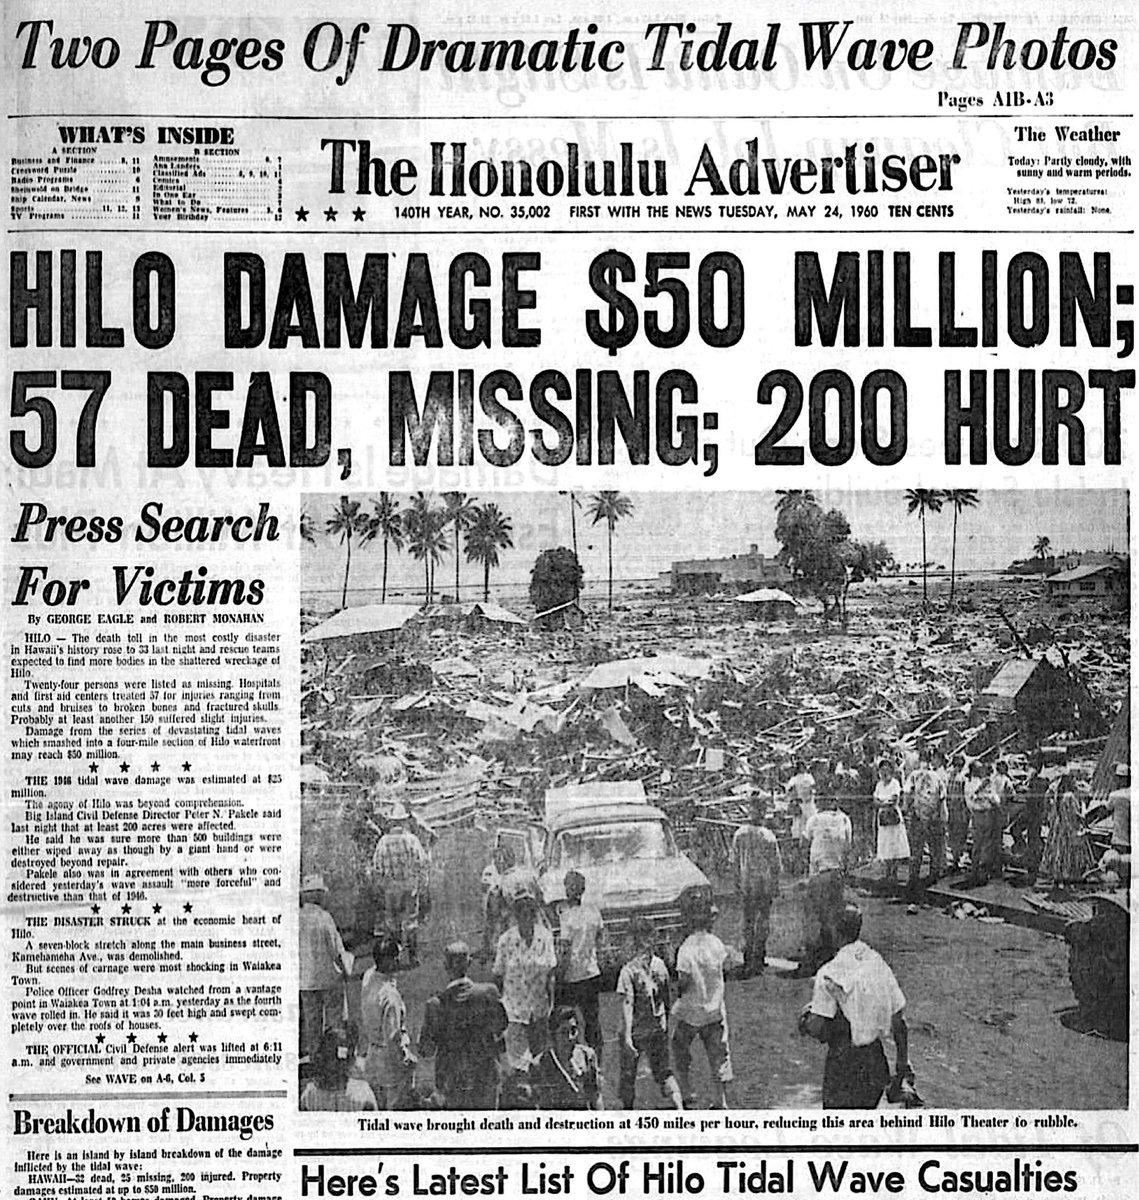 tsunami hawaii 1960 tsunami 4 the 1960 chilean